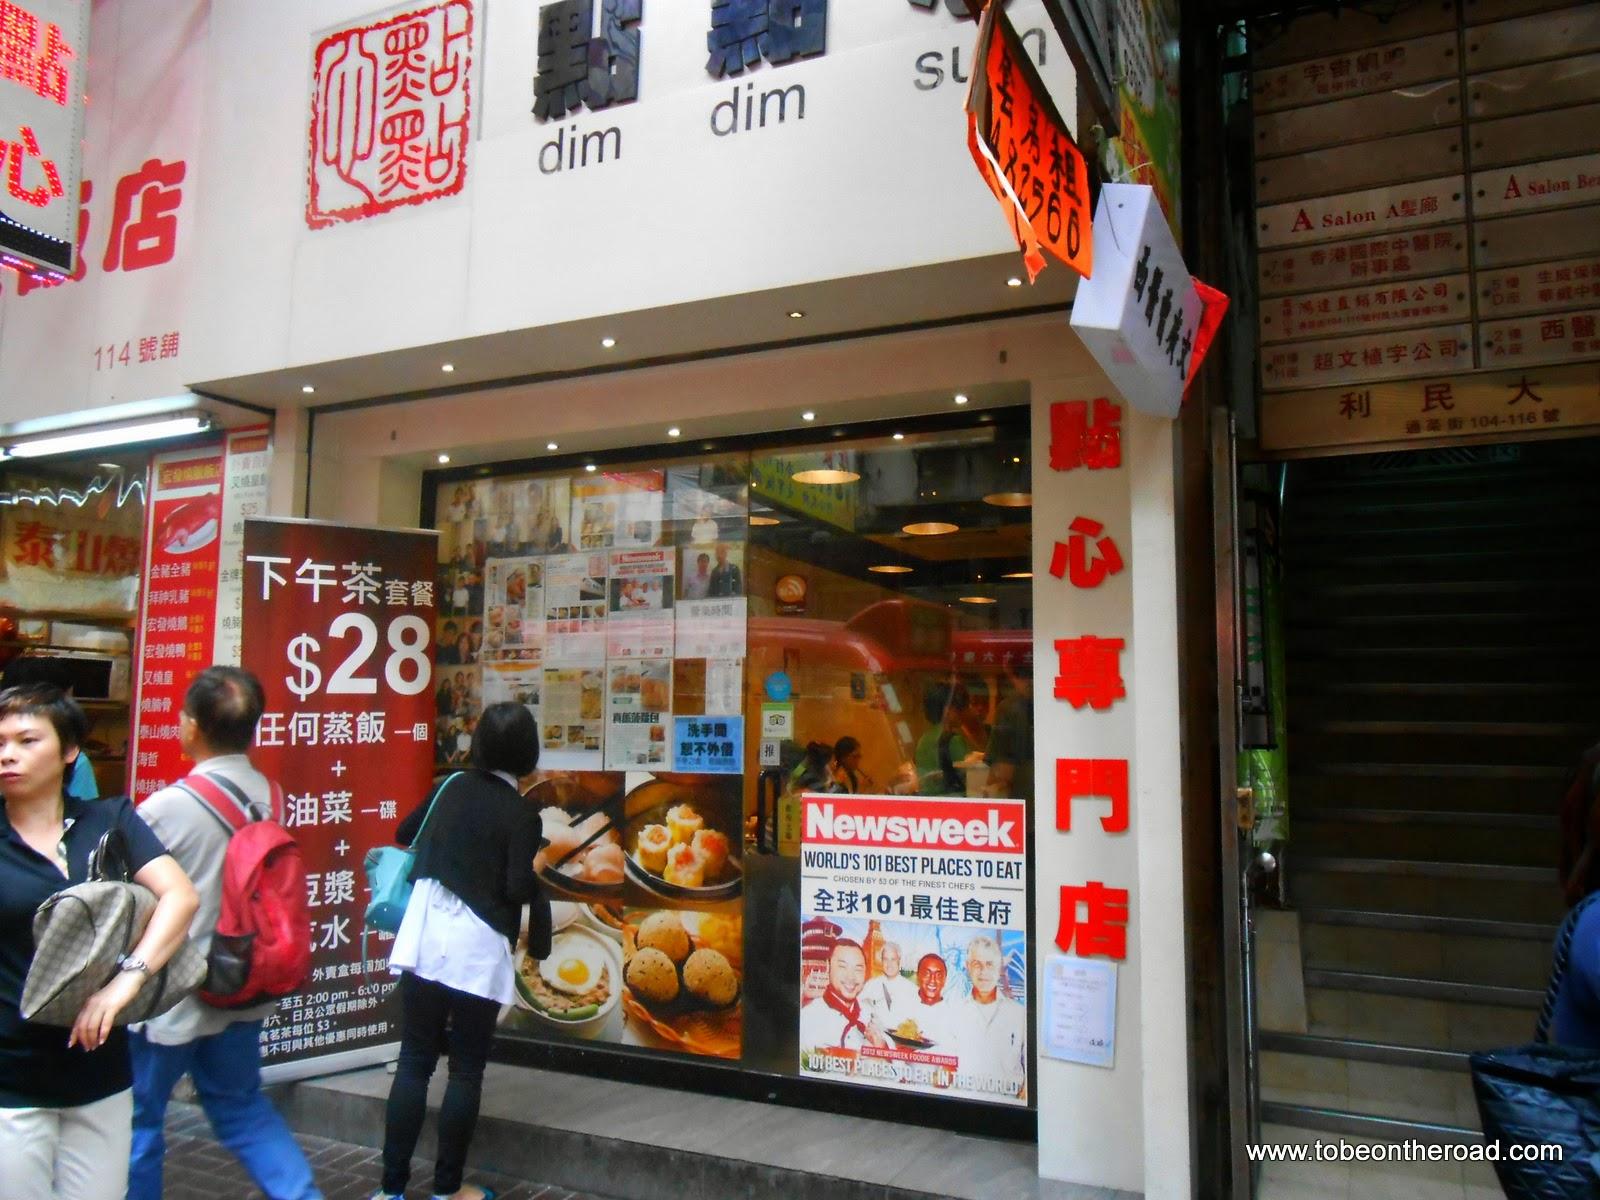 Hongkong, Dim Dim Sum, Newsweek, Best Places,